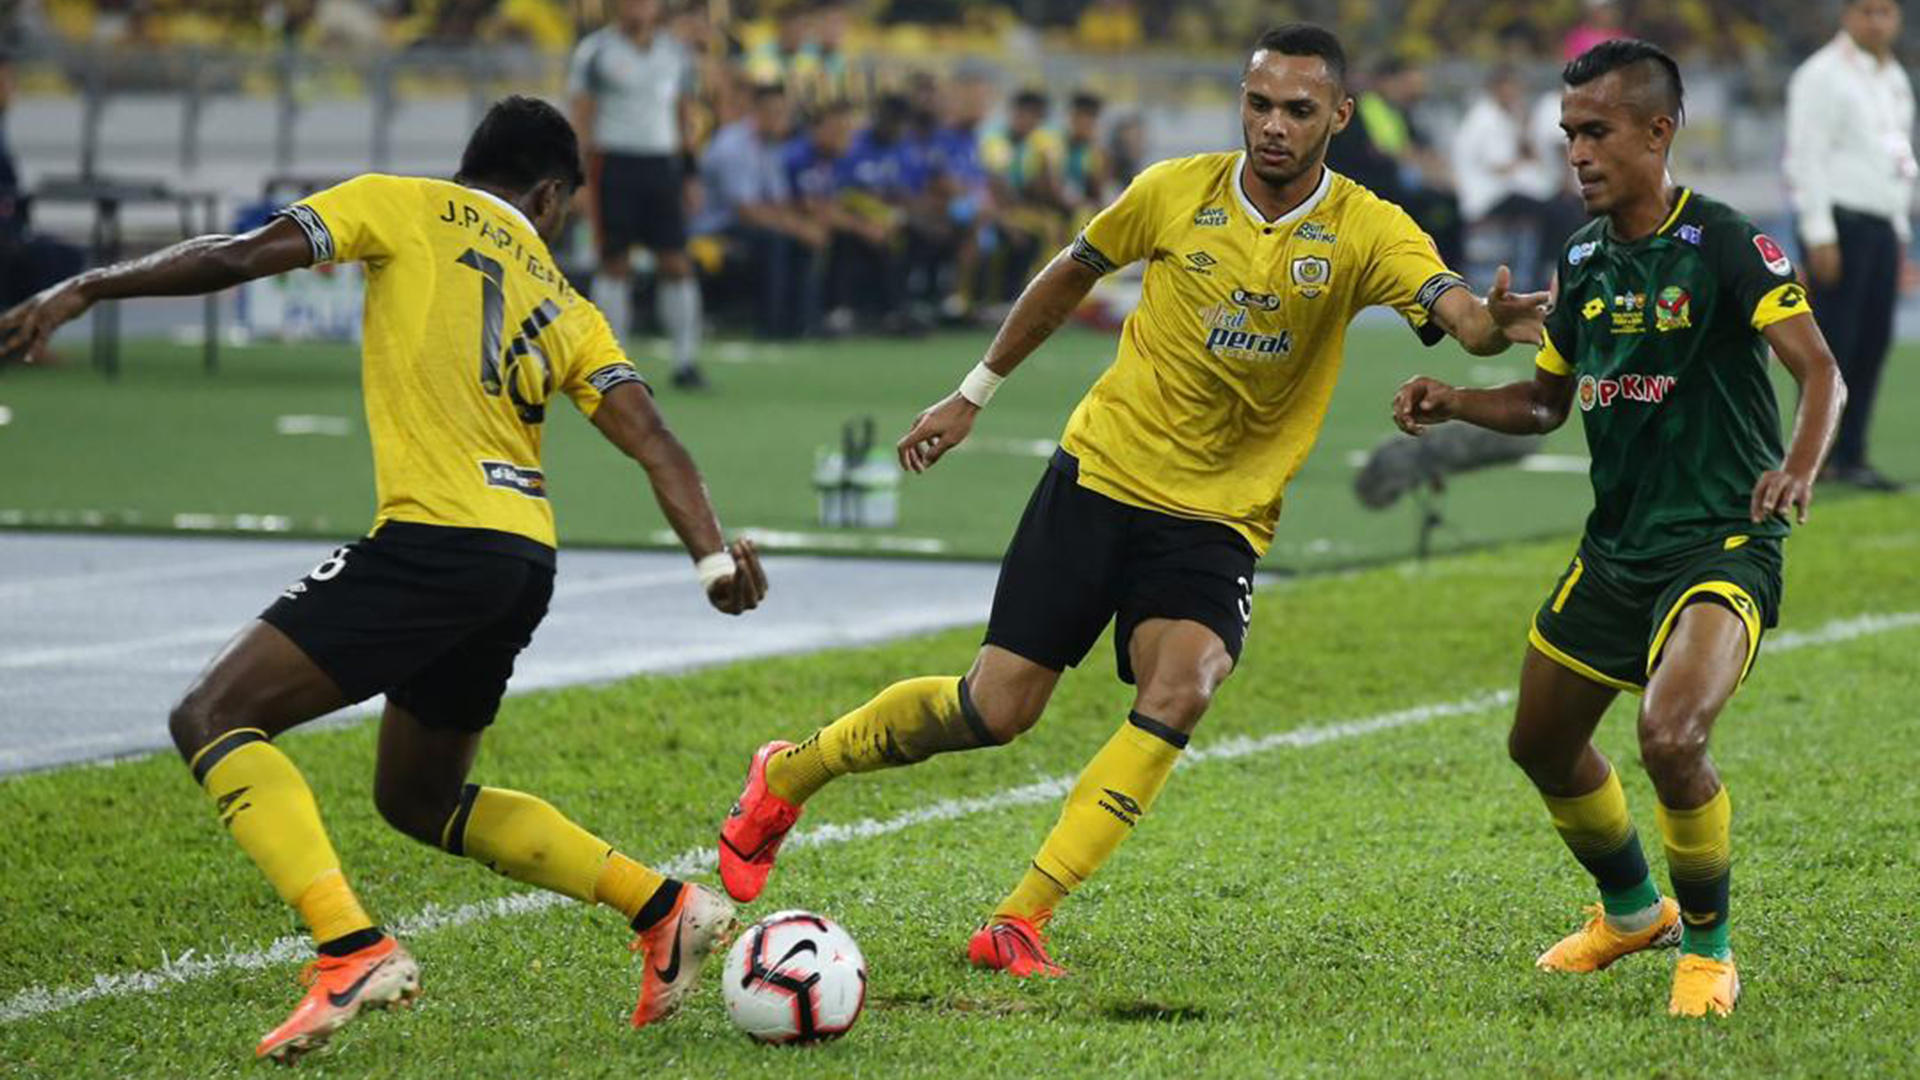 Raianderson da Costa Morais, J. Partiban, Shakir HamzahPerak v Kedah, Malaysia Fa Cup final, 27 Jul 2019